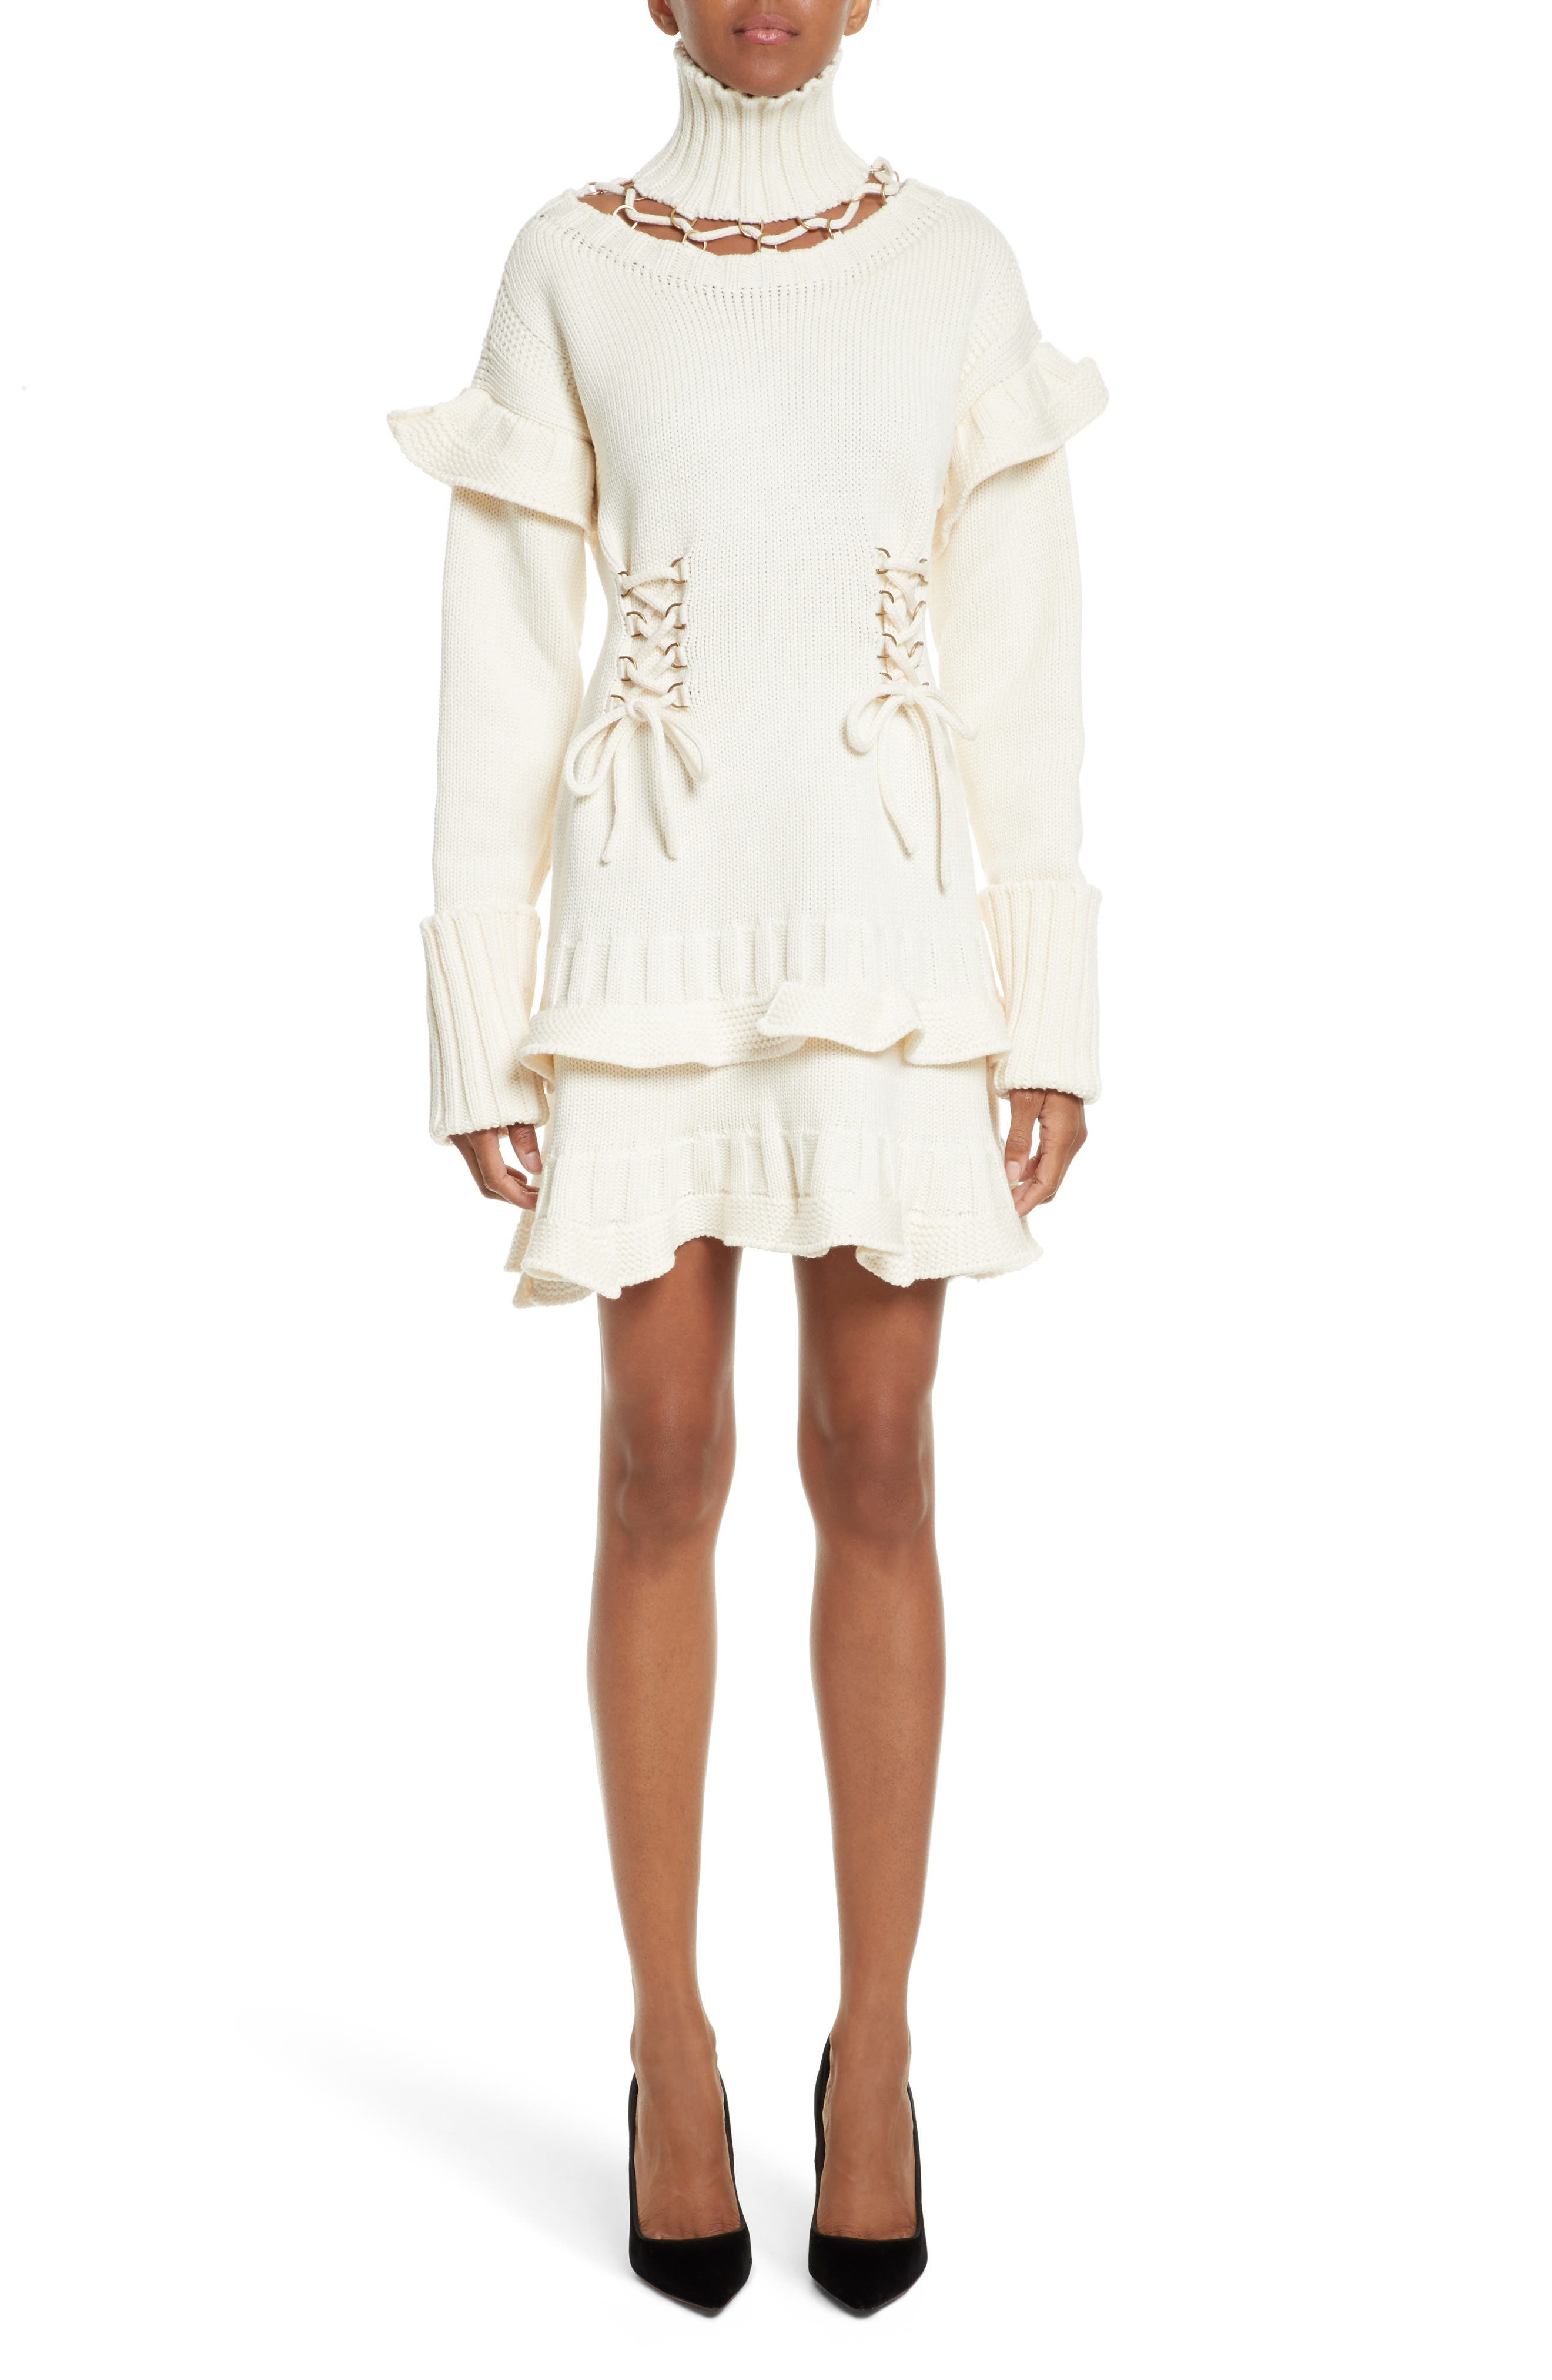 Alexander McQueen Lace-Up Turtleneck Sweater Dress